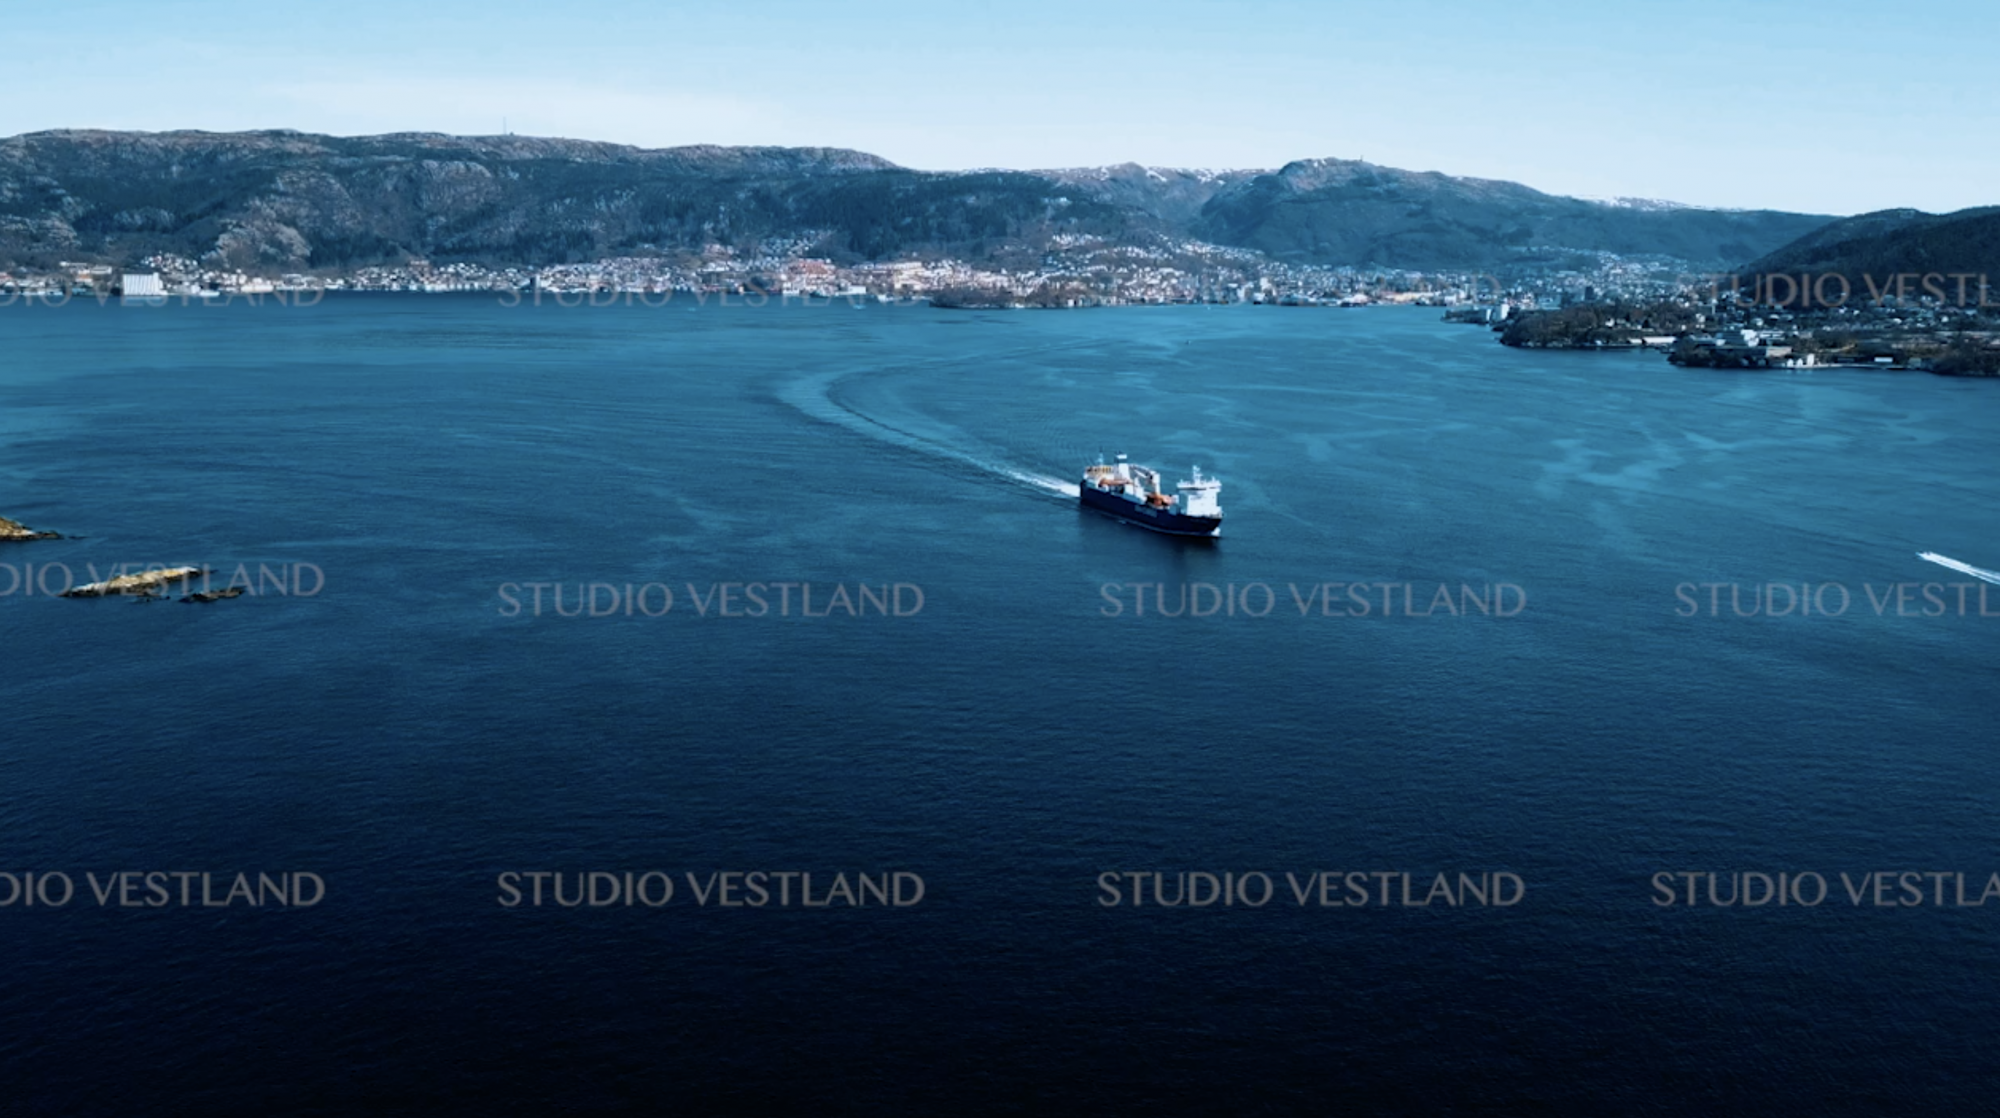 Studio Vestland - Bergen V02